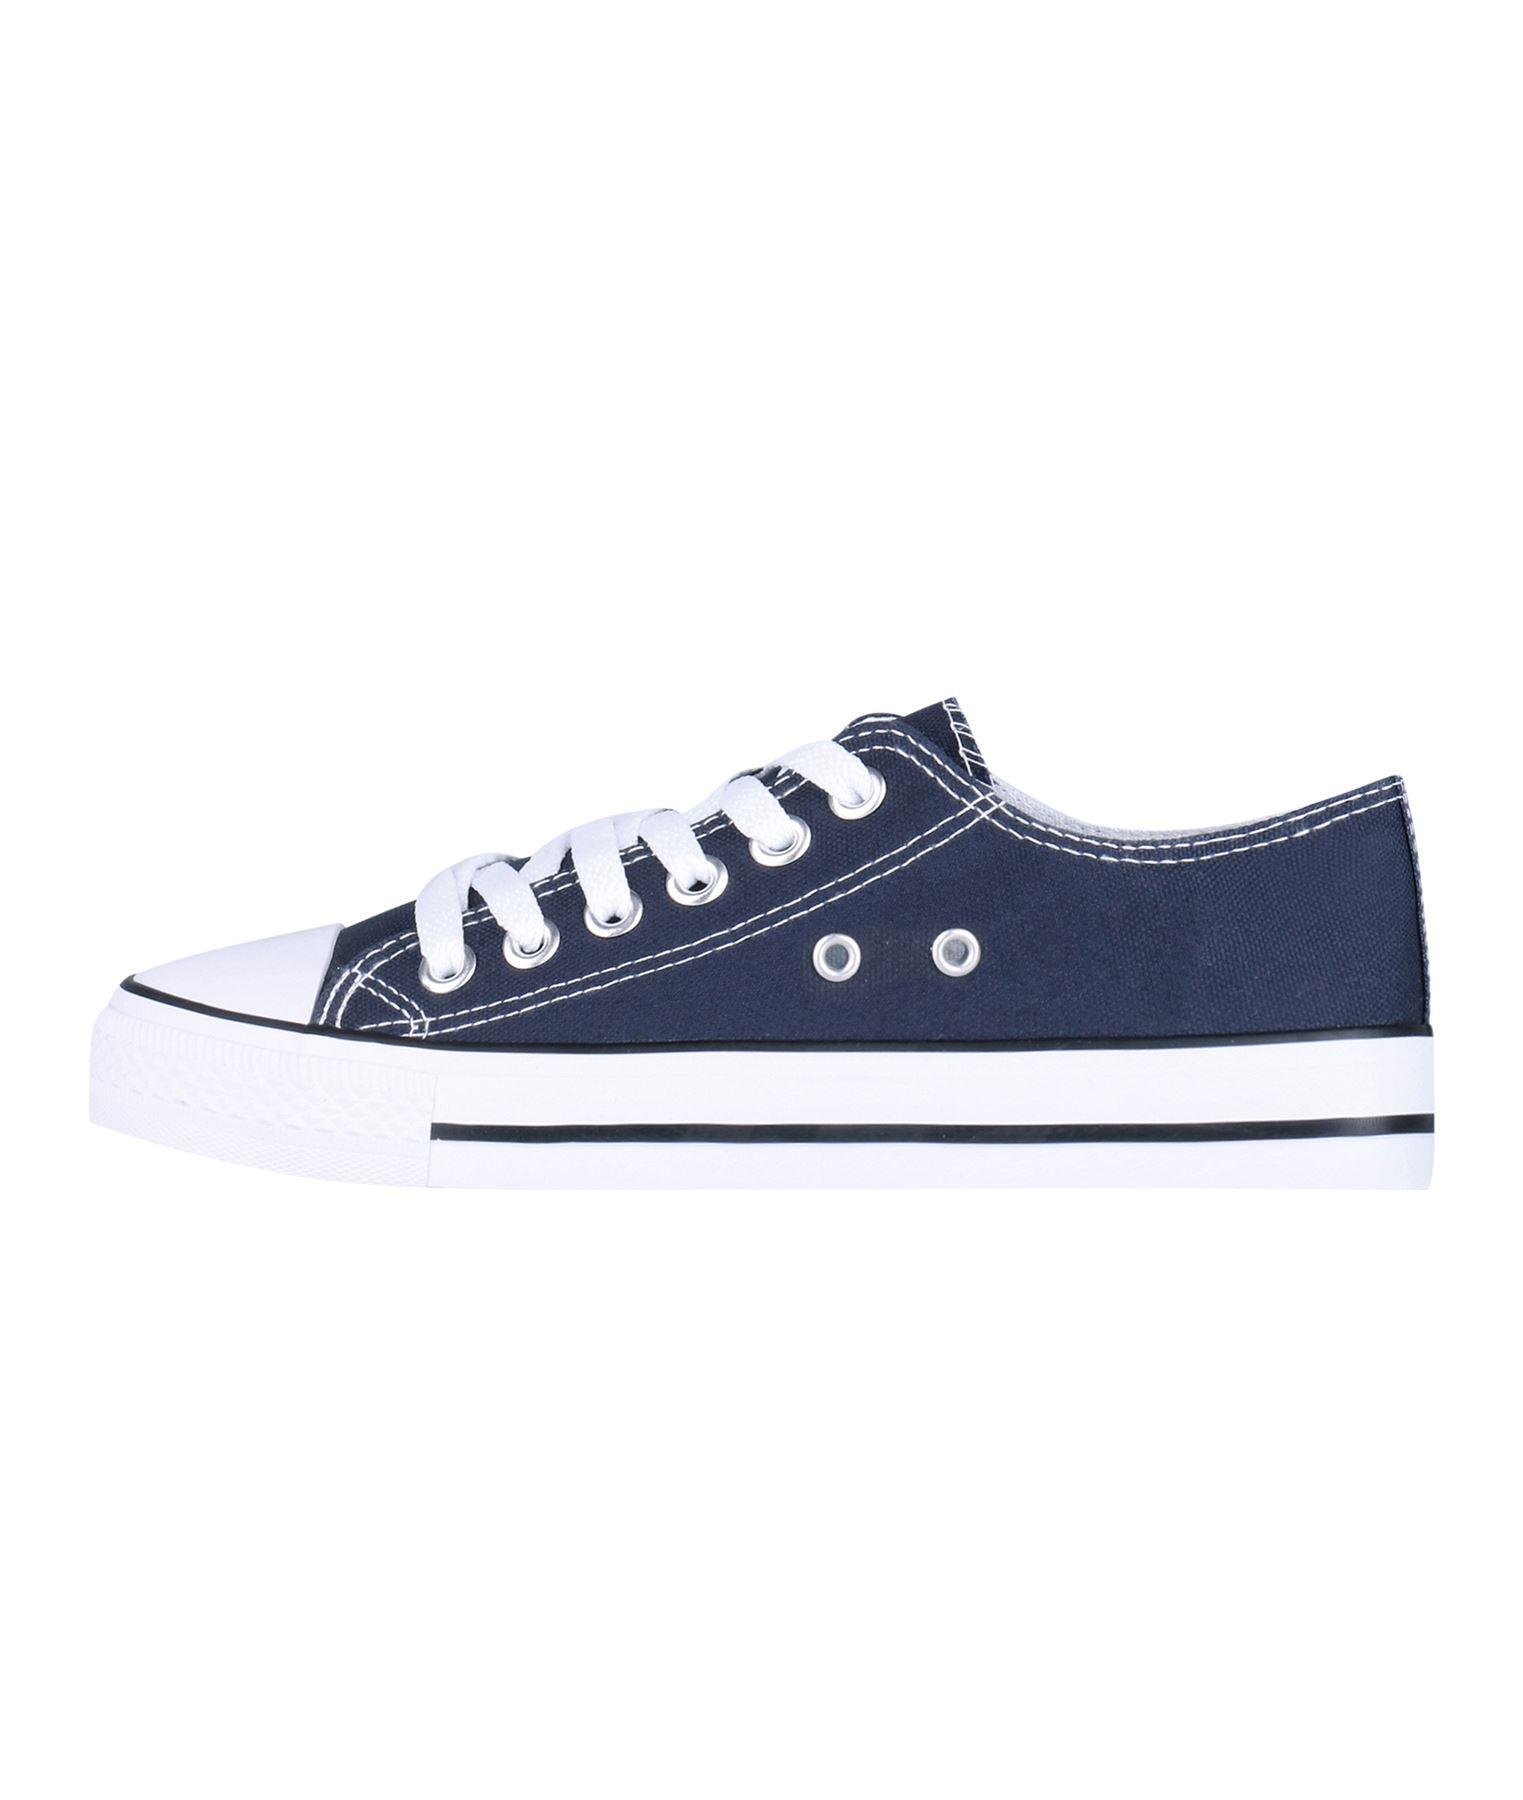 Zapatillas-Mujer-Casuales-Deportiva-Barata-Lona-Moda-Originales-Outlet-Tela-Moda miniatura 6